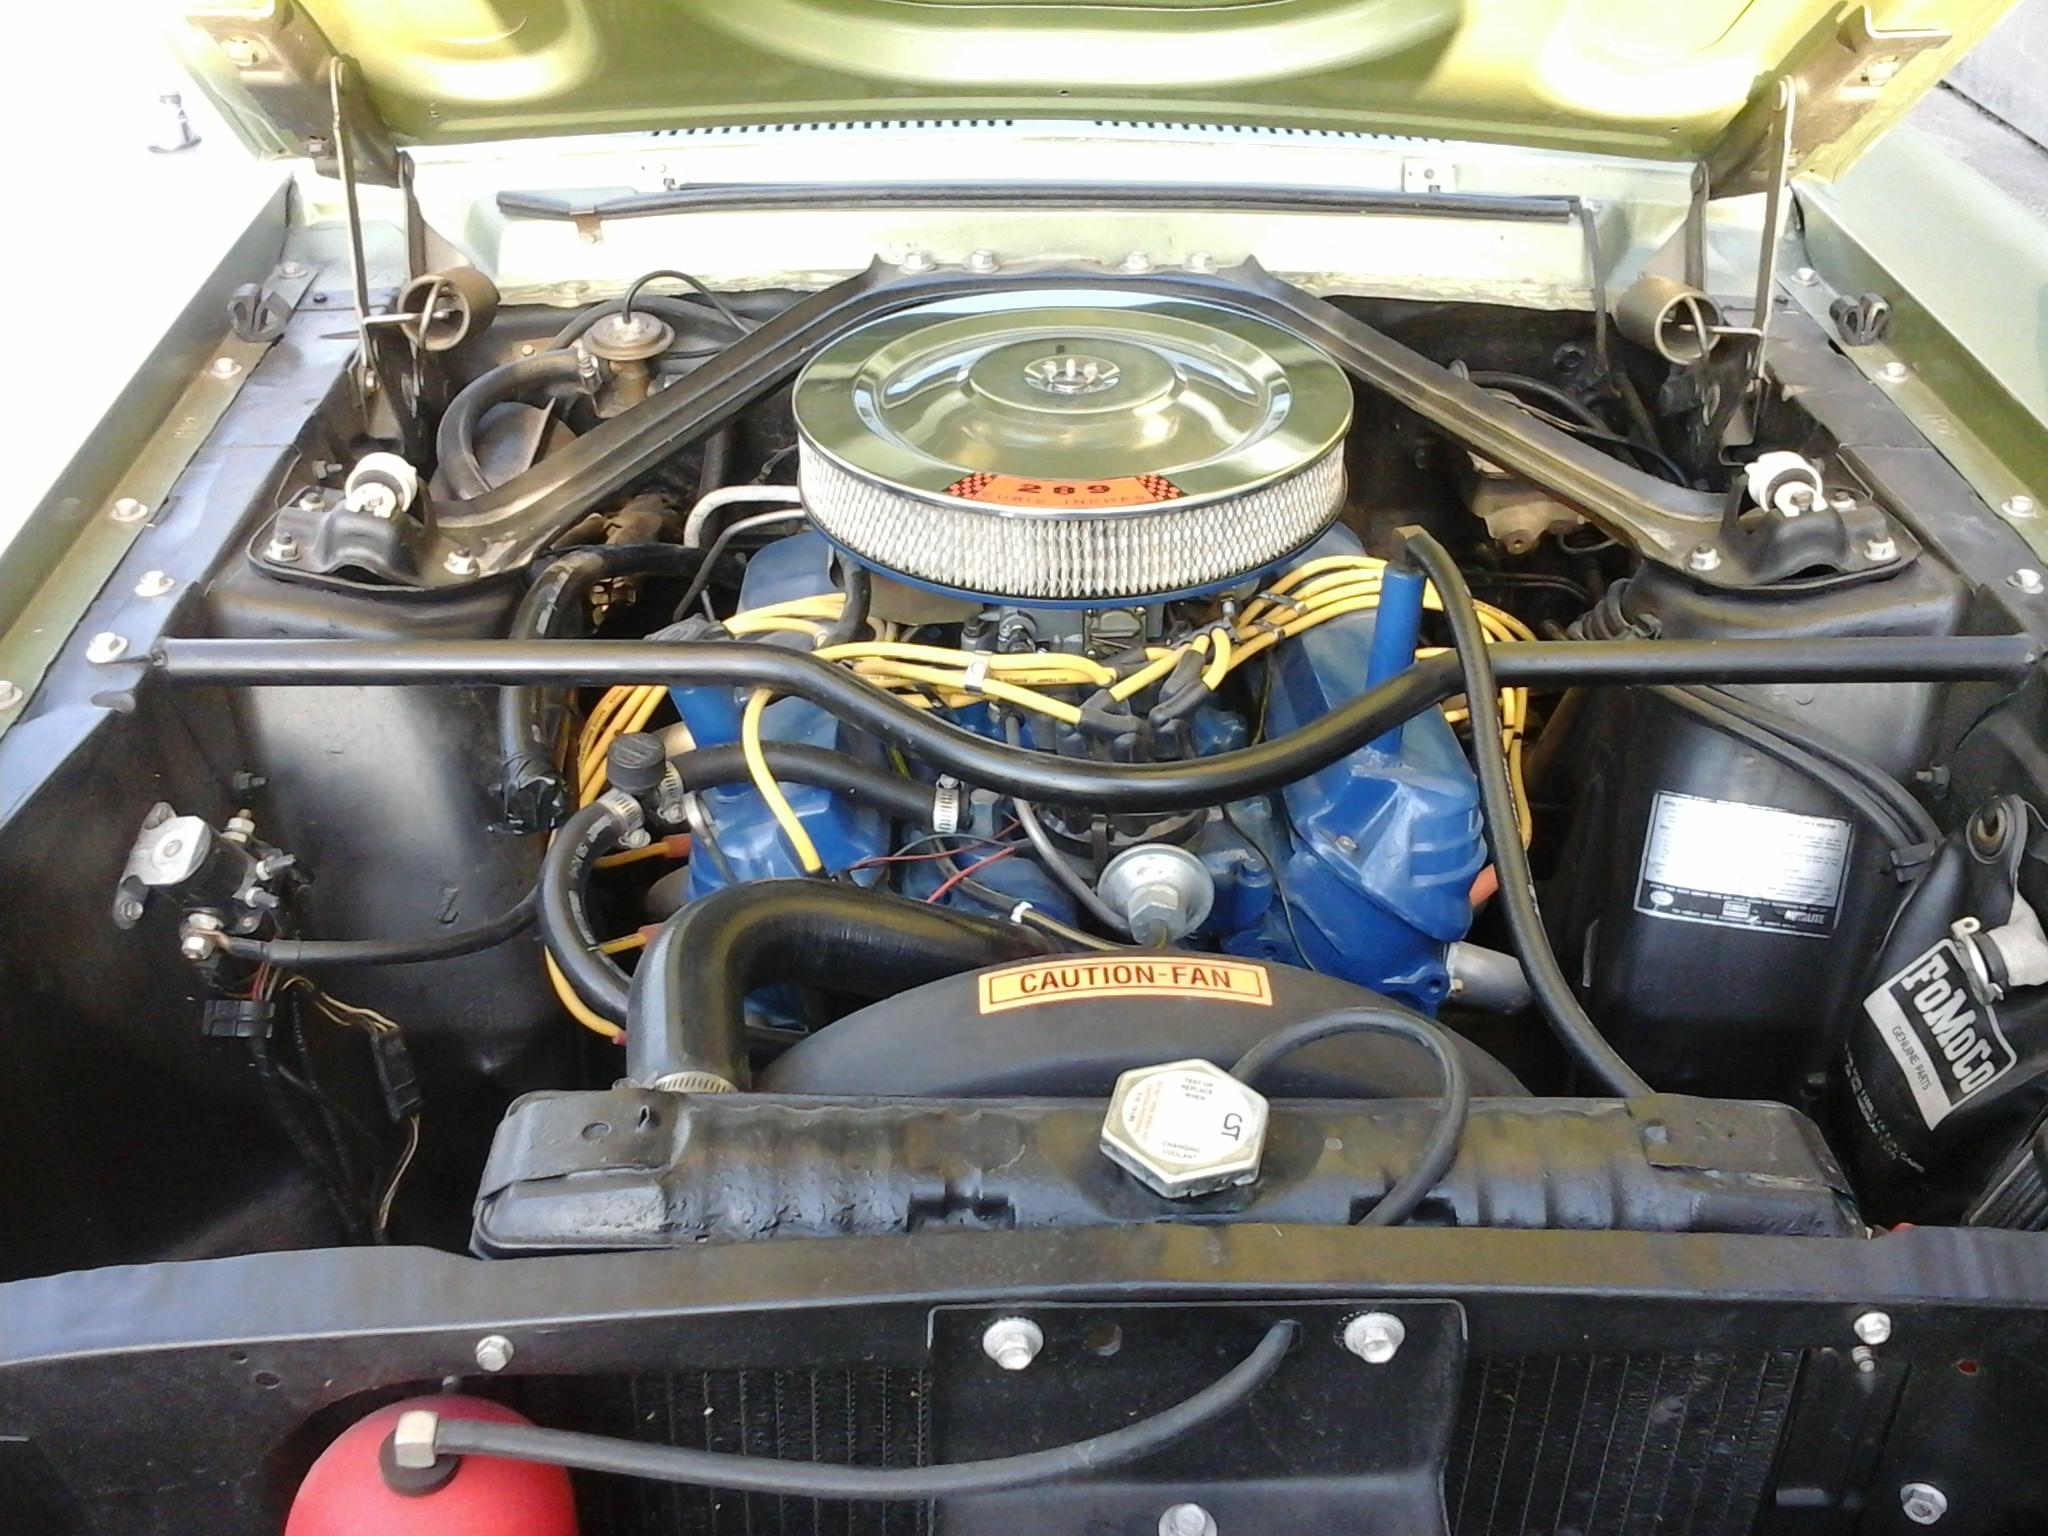 Kendall's 67 Motor